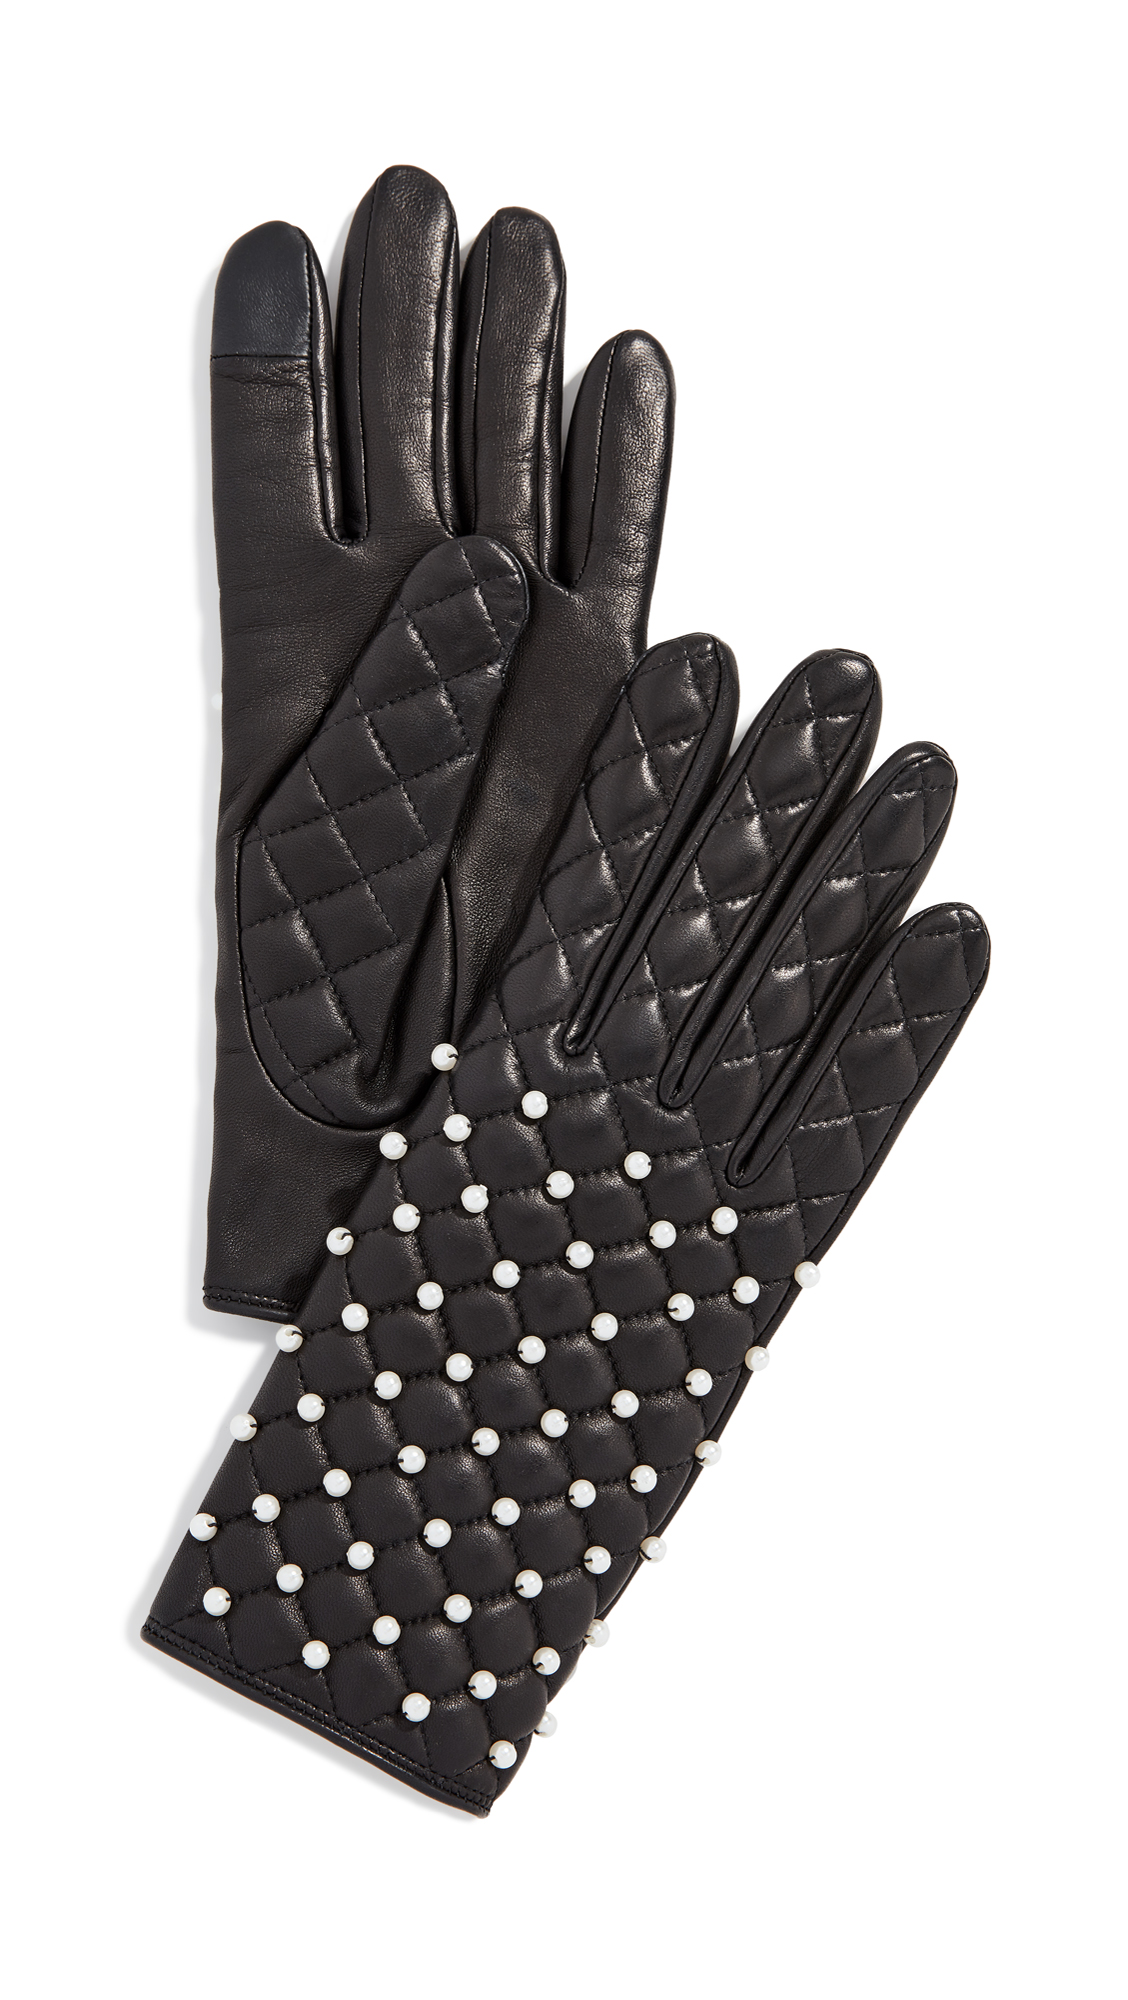 AGNELLE Chloe Pearl Gloves, Black/Pearl